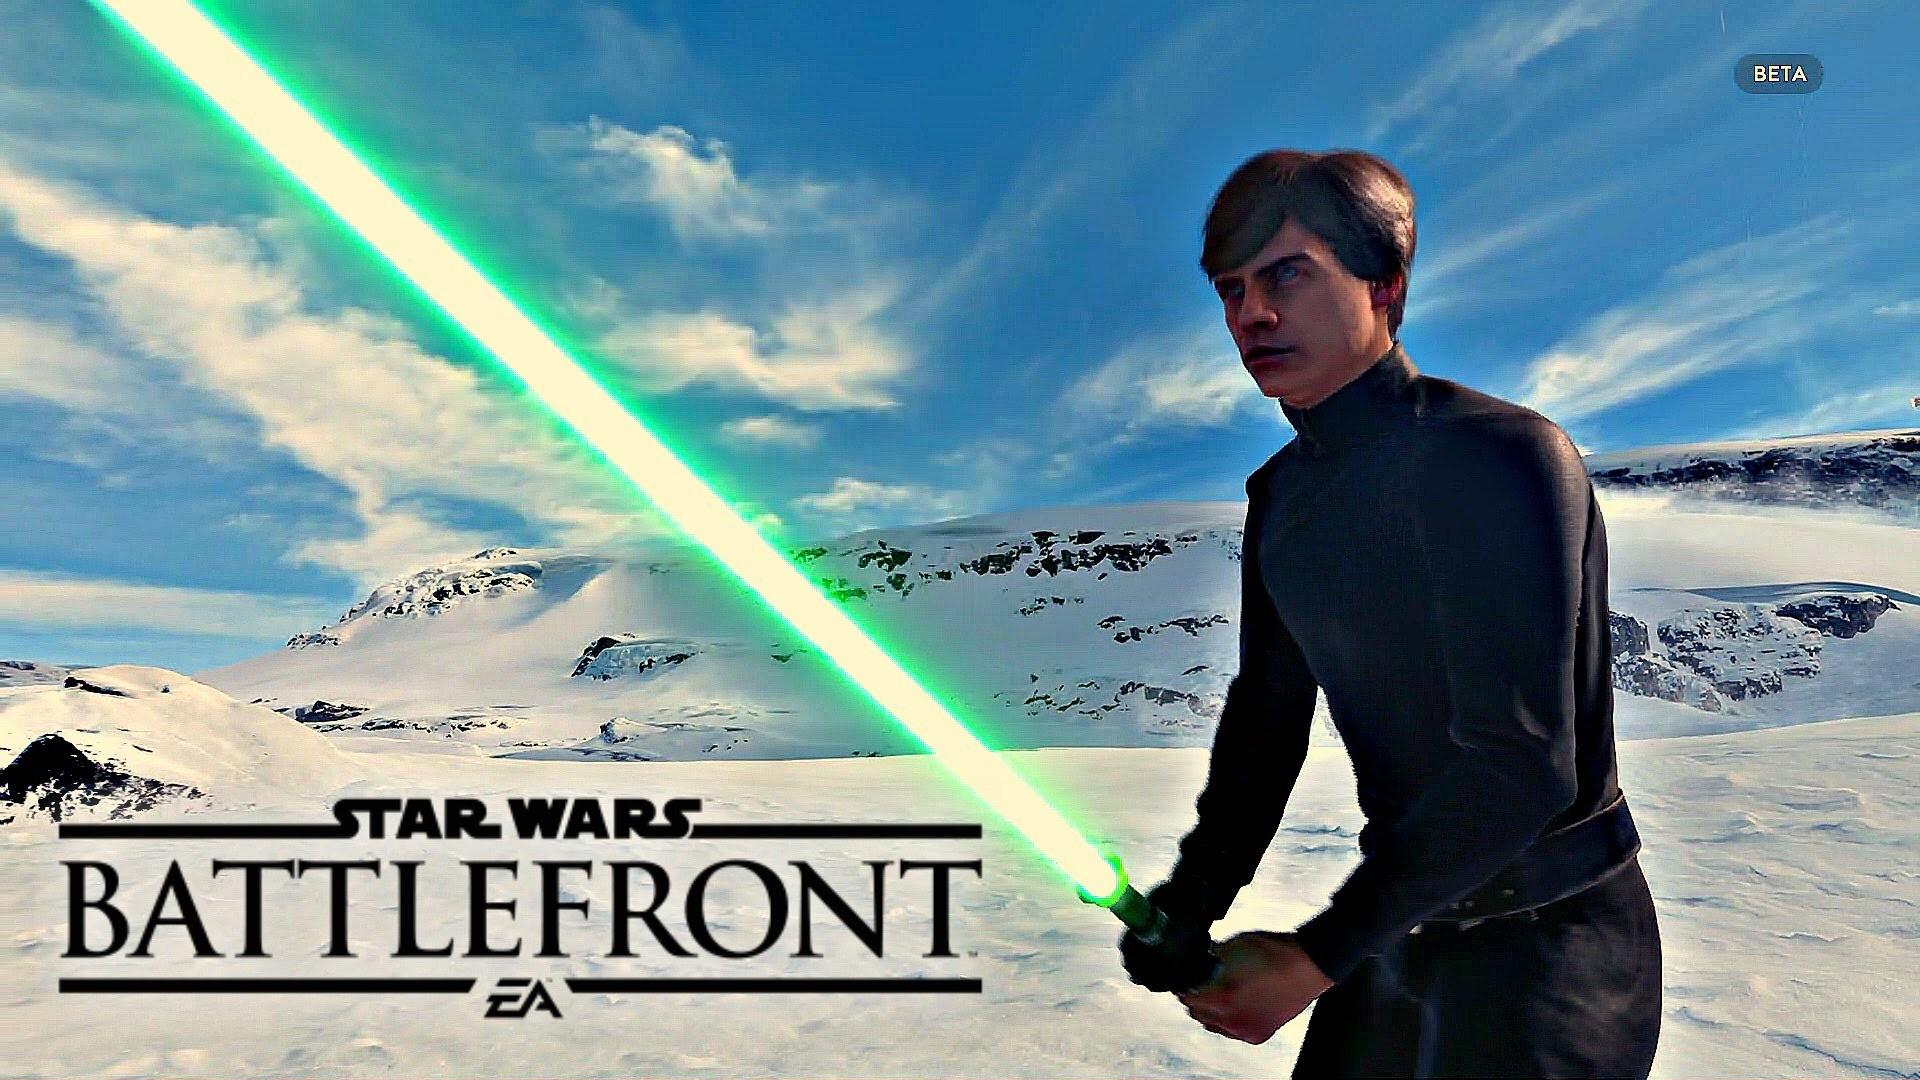 Star Wars Battlefront Walker Assault – LUKE SKYWALKER! (Ps4/Xbox One Beta  Gameplay 1080p HD) – YouTube